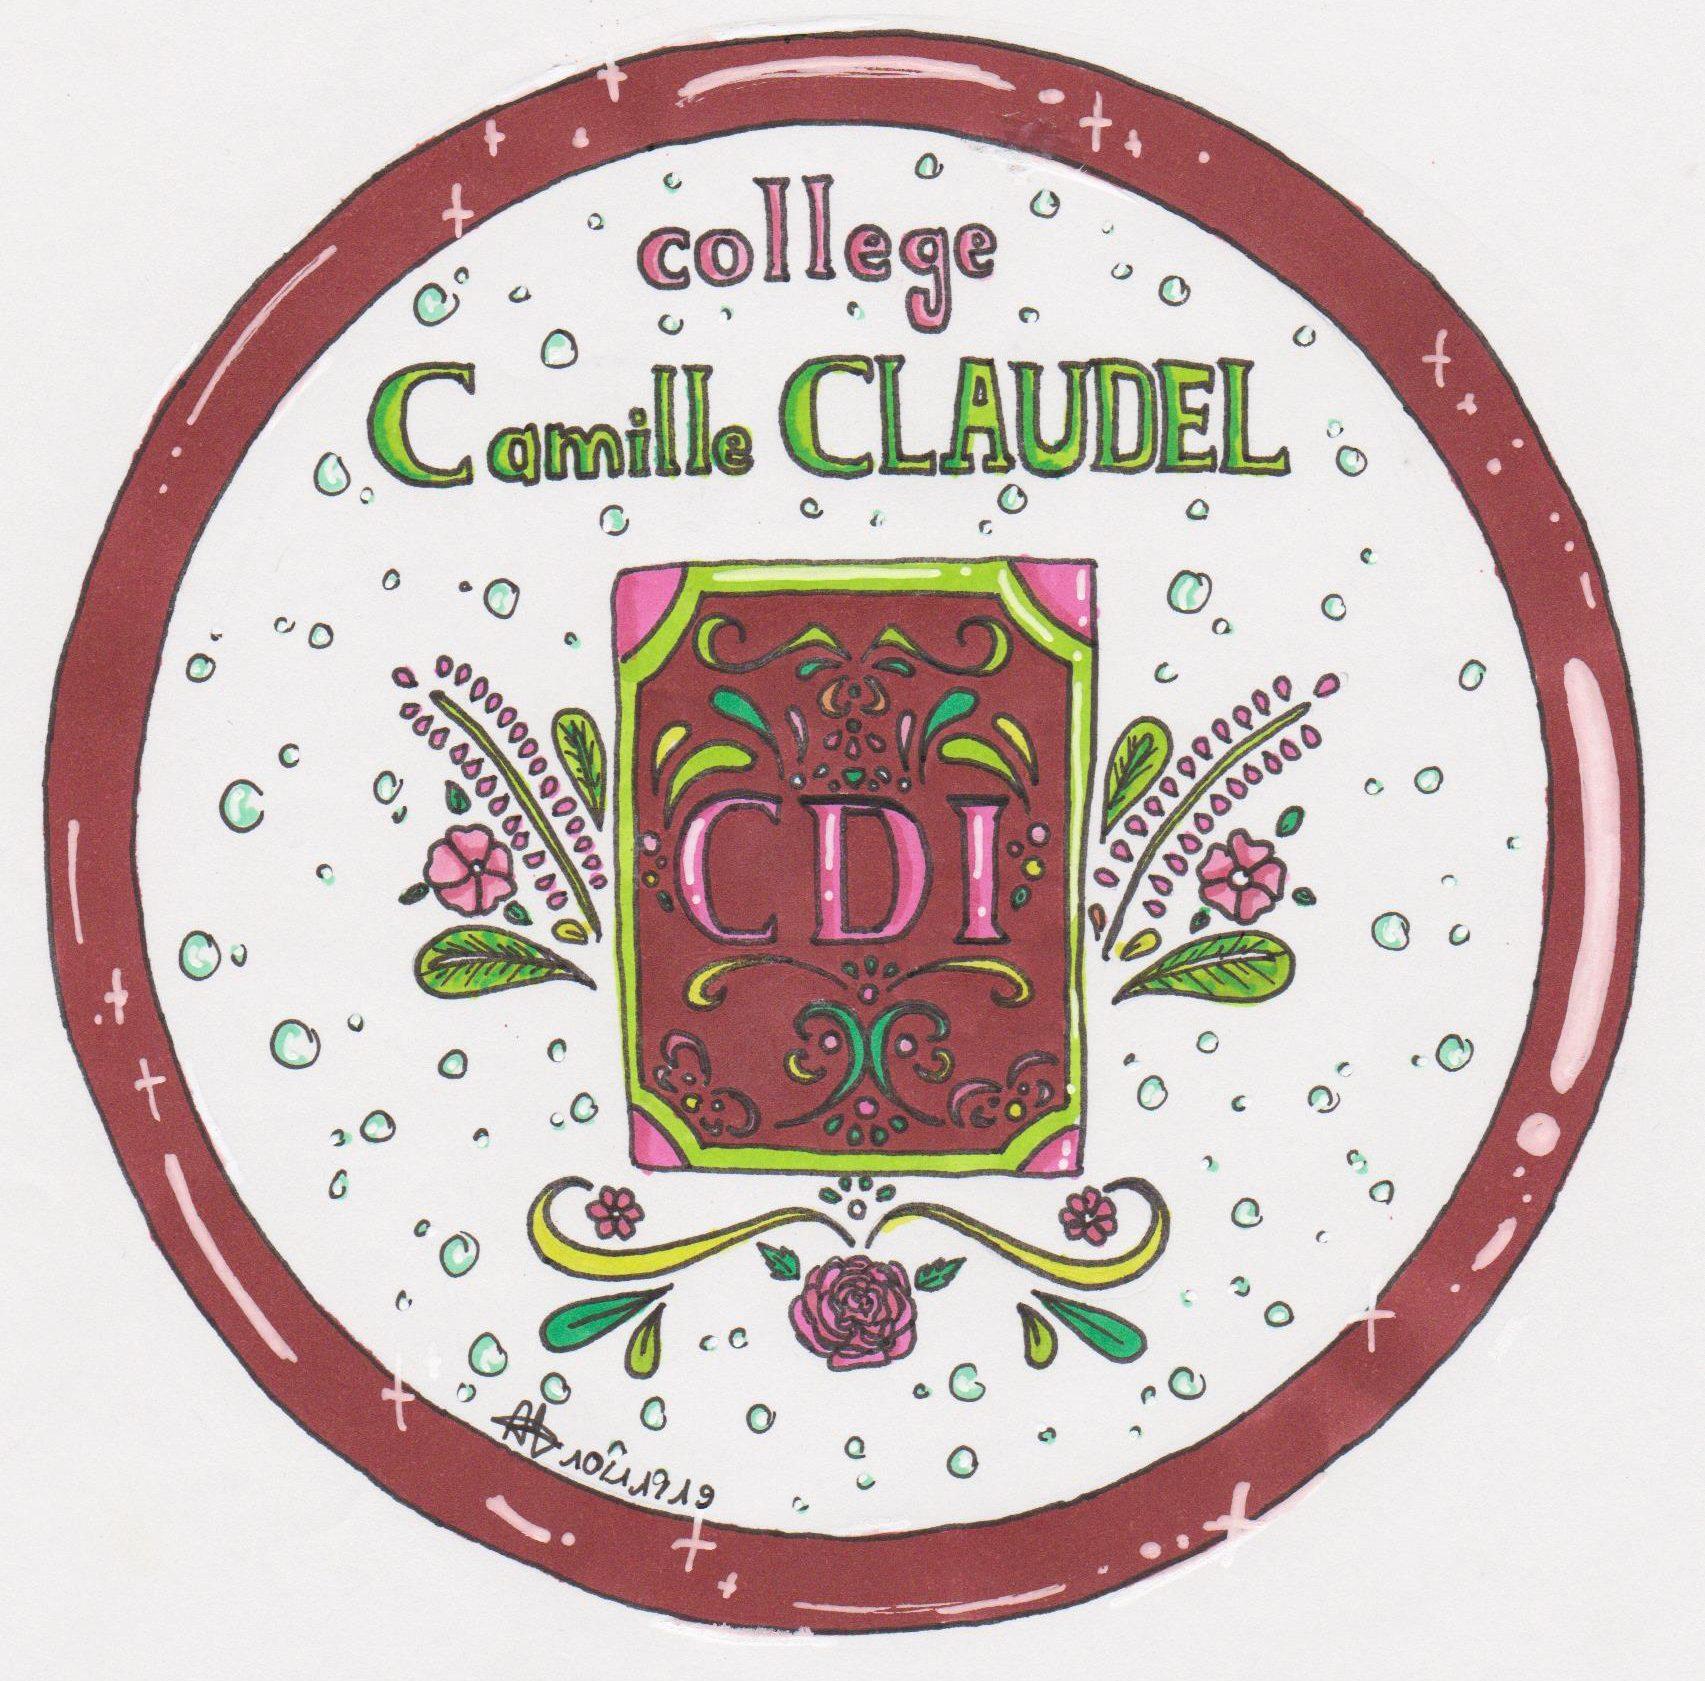 logo CDI 2019.jpg